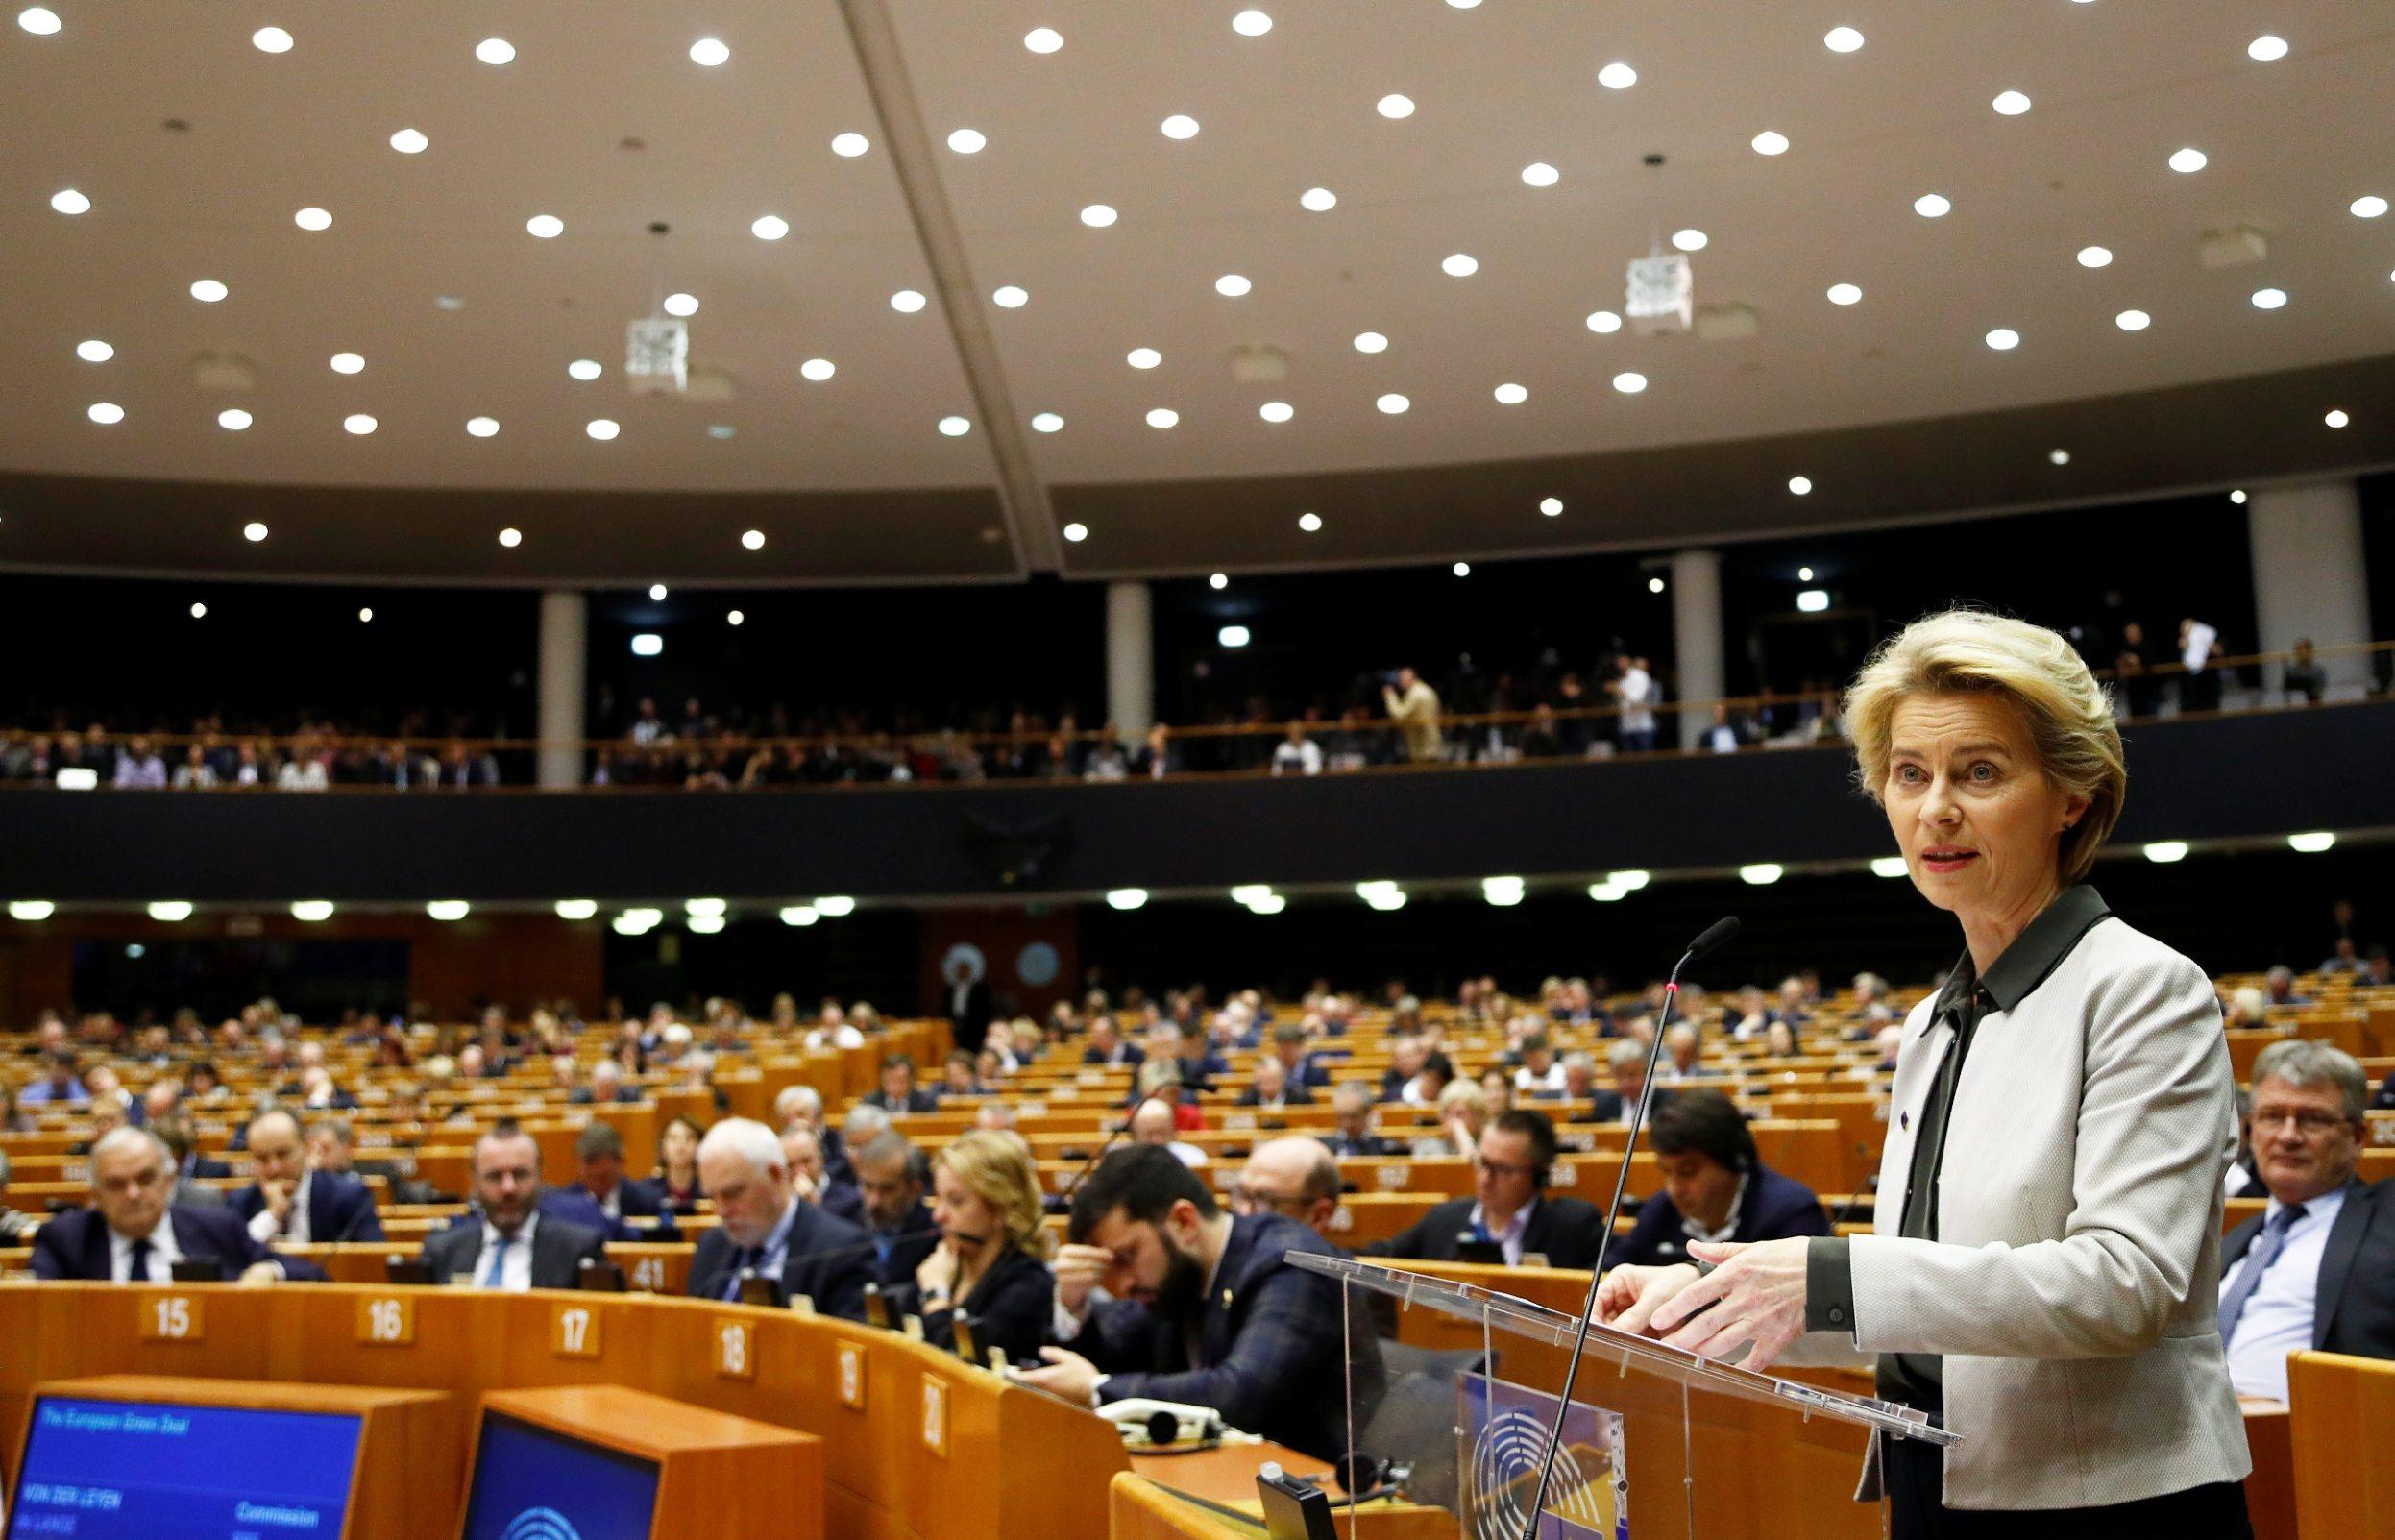 Predsjednica Europske komisije Ursula von der Leyen prilikom predstavljanja europskog Zelenog sporazuma na sjednici Europskog parlamenta u Bruxellesu, 11.12.2019.